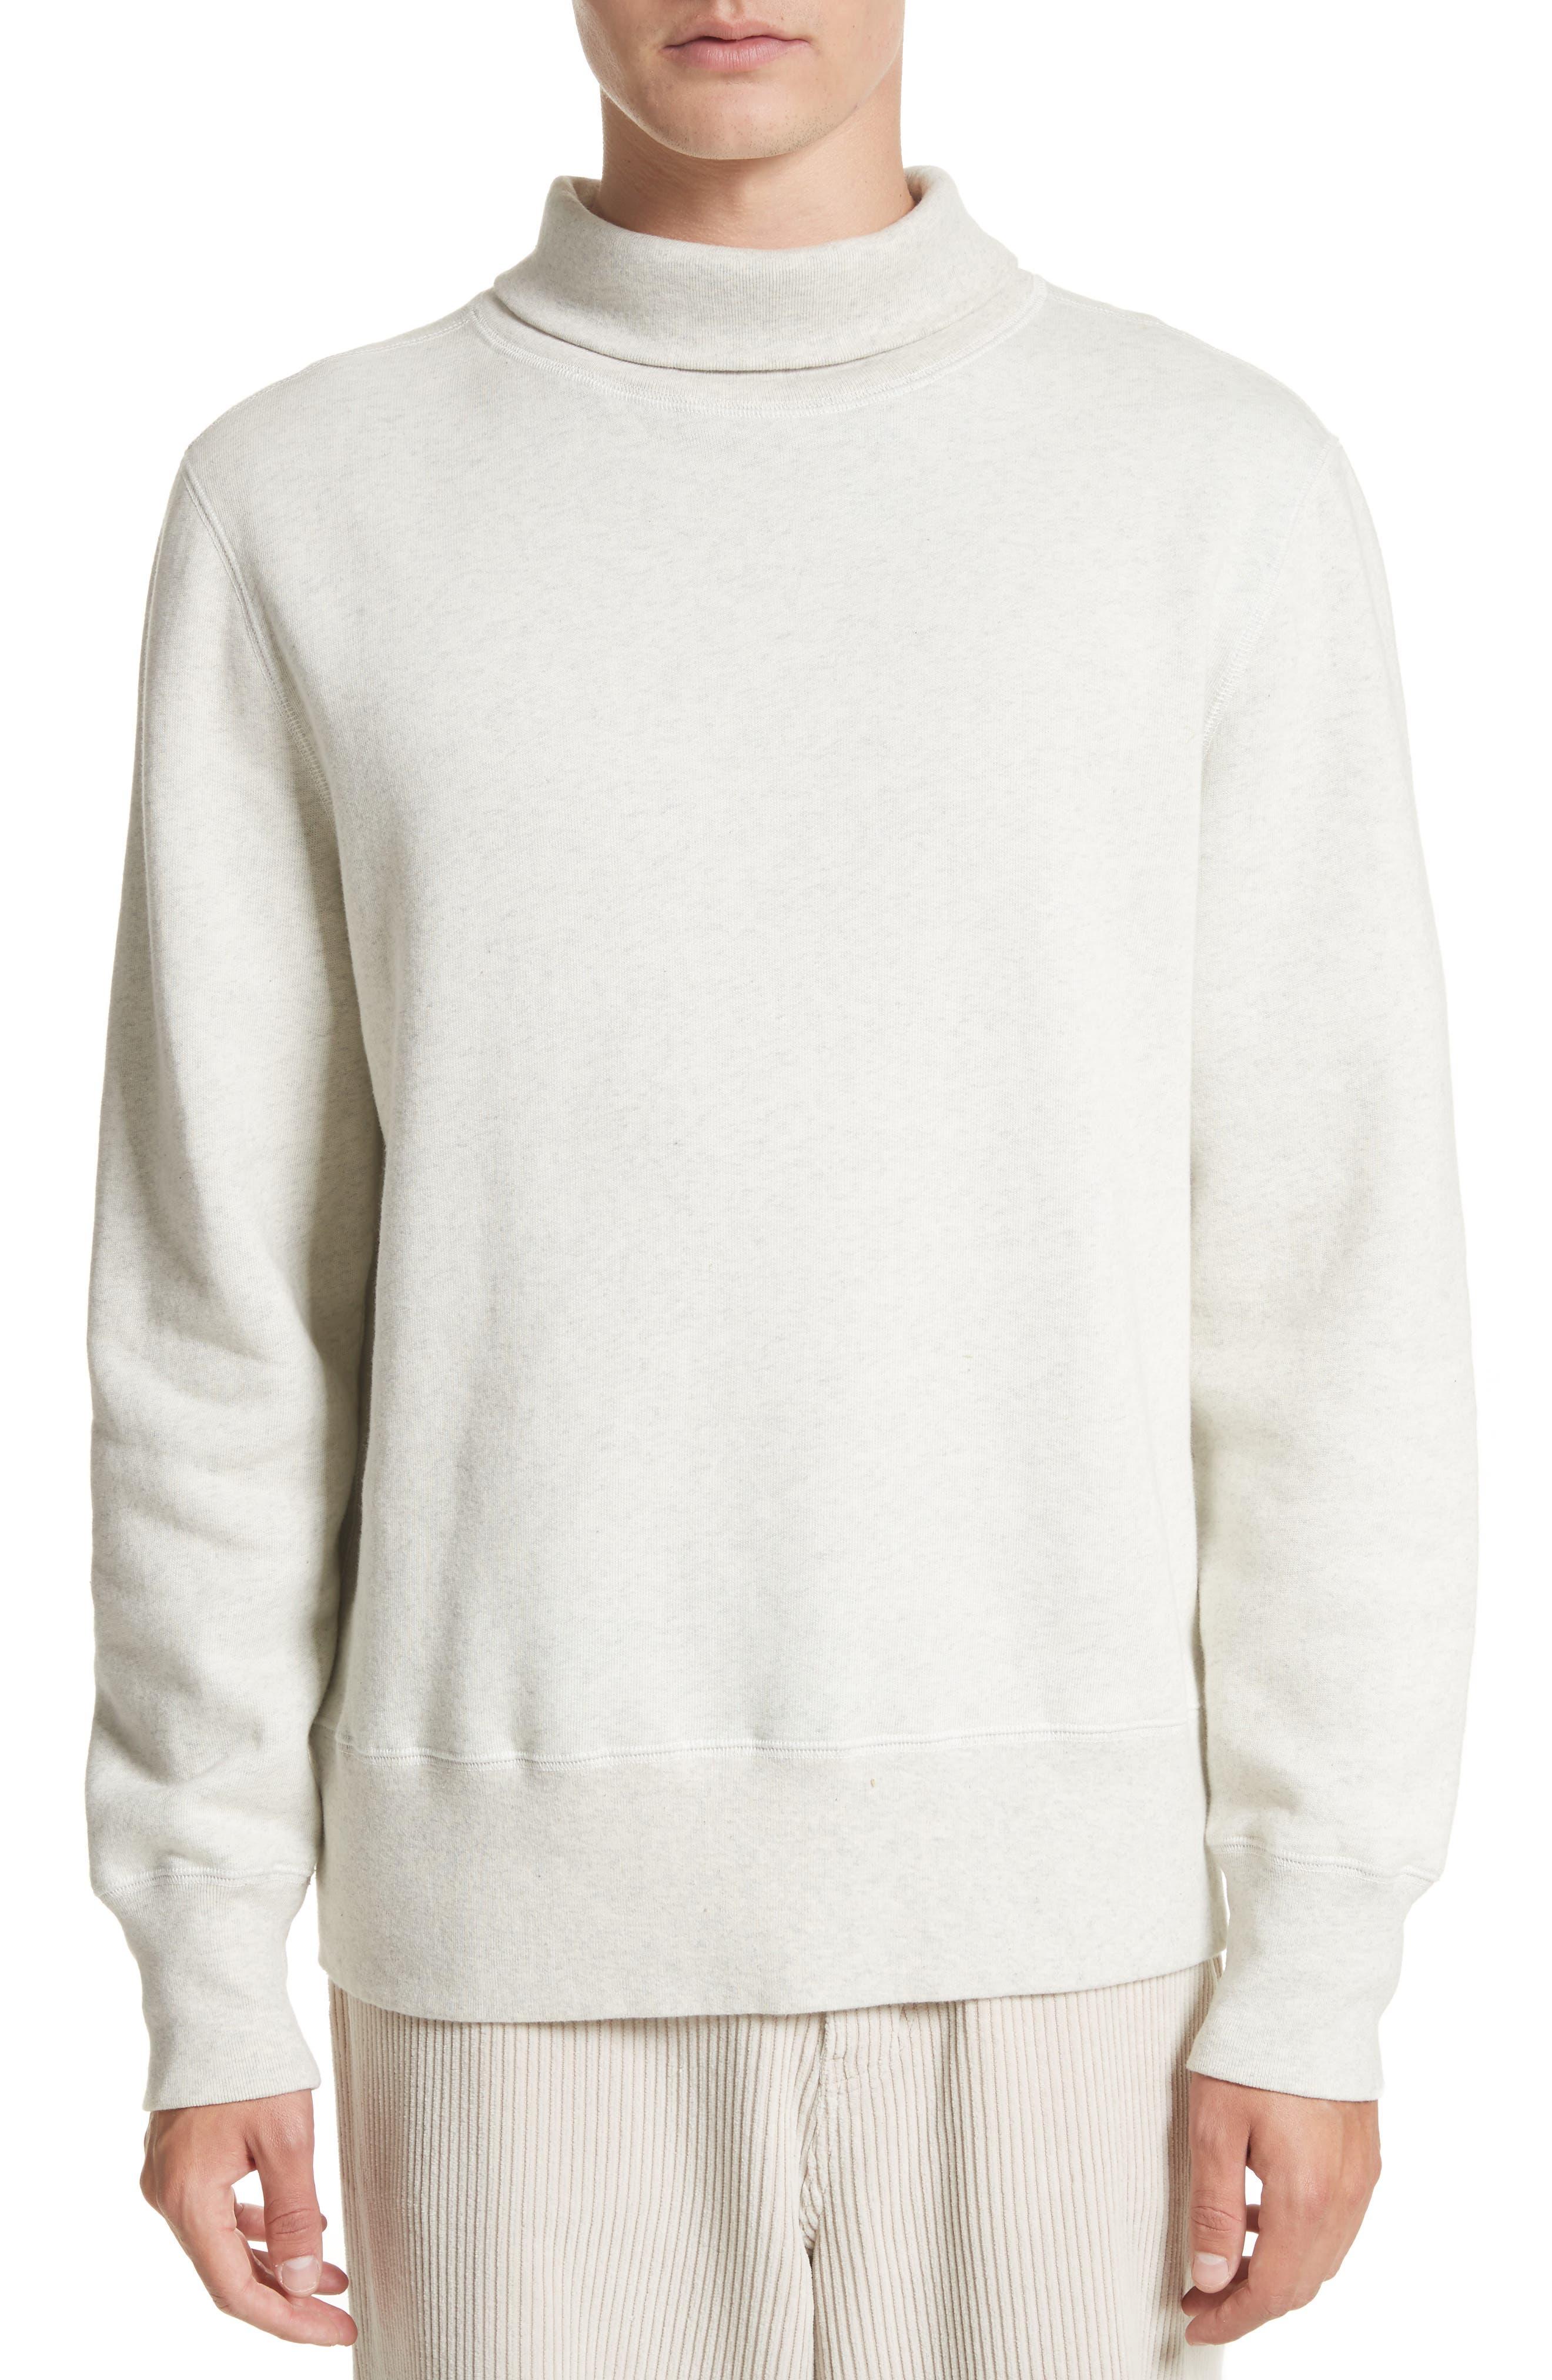 Turtleneck Sweater,                         Main,                         color, White